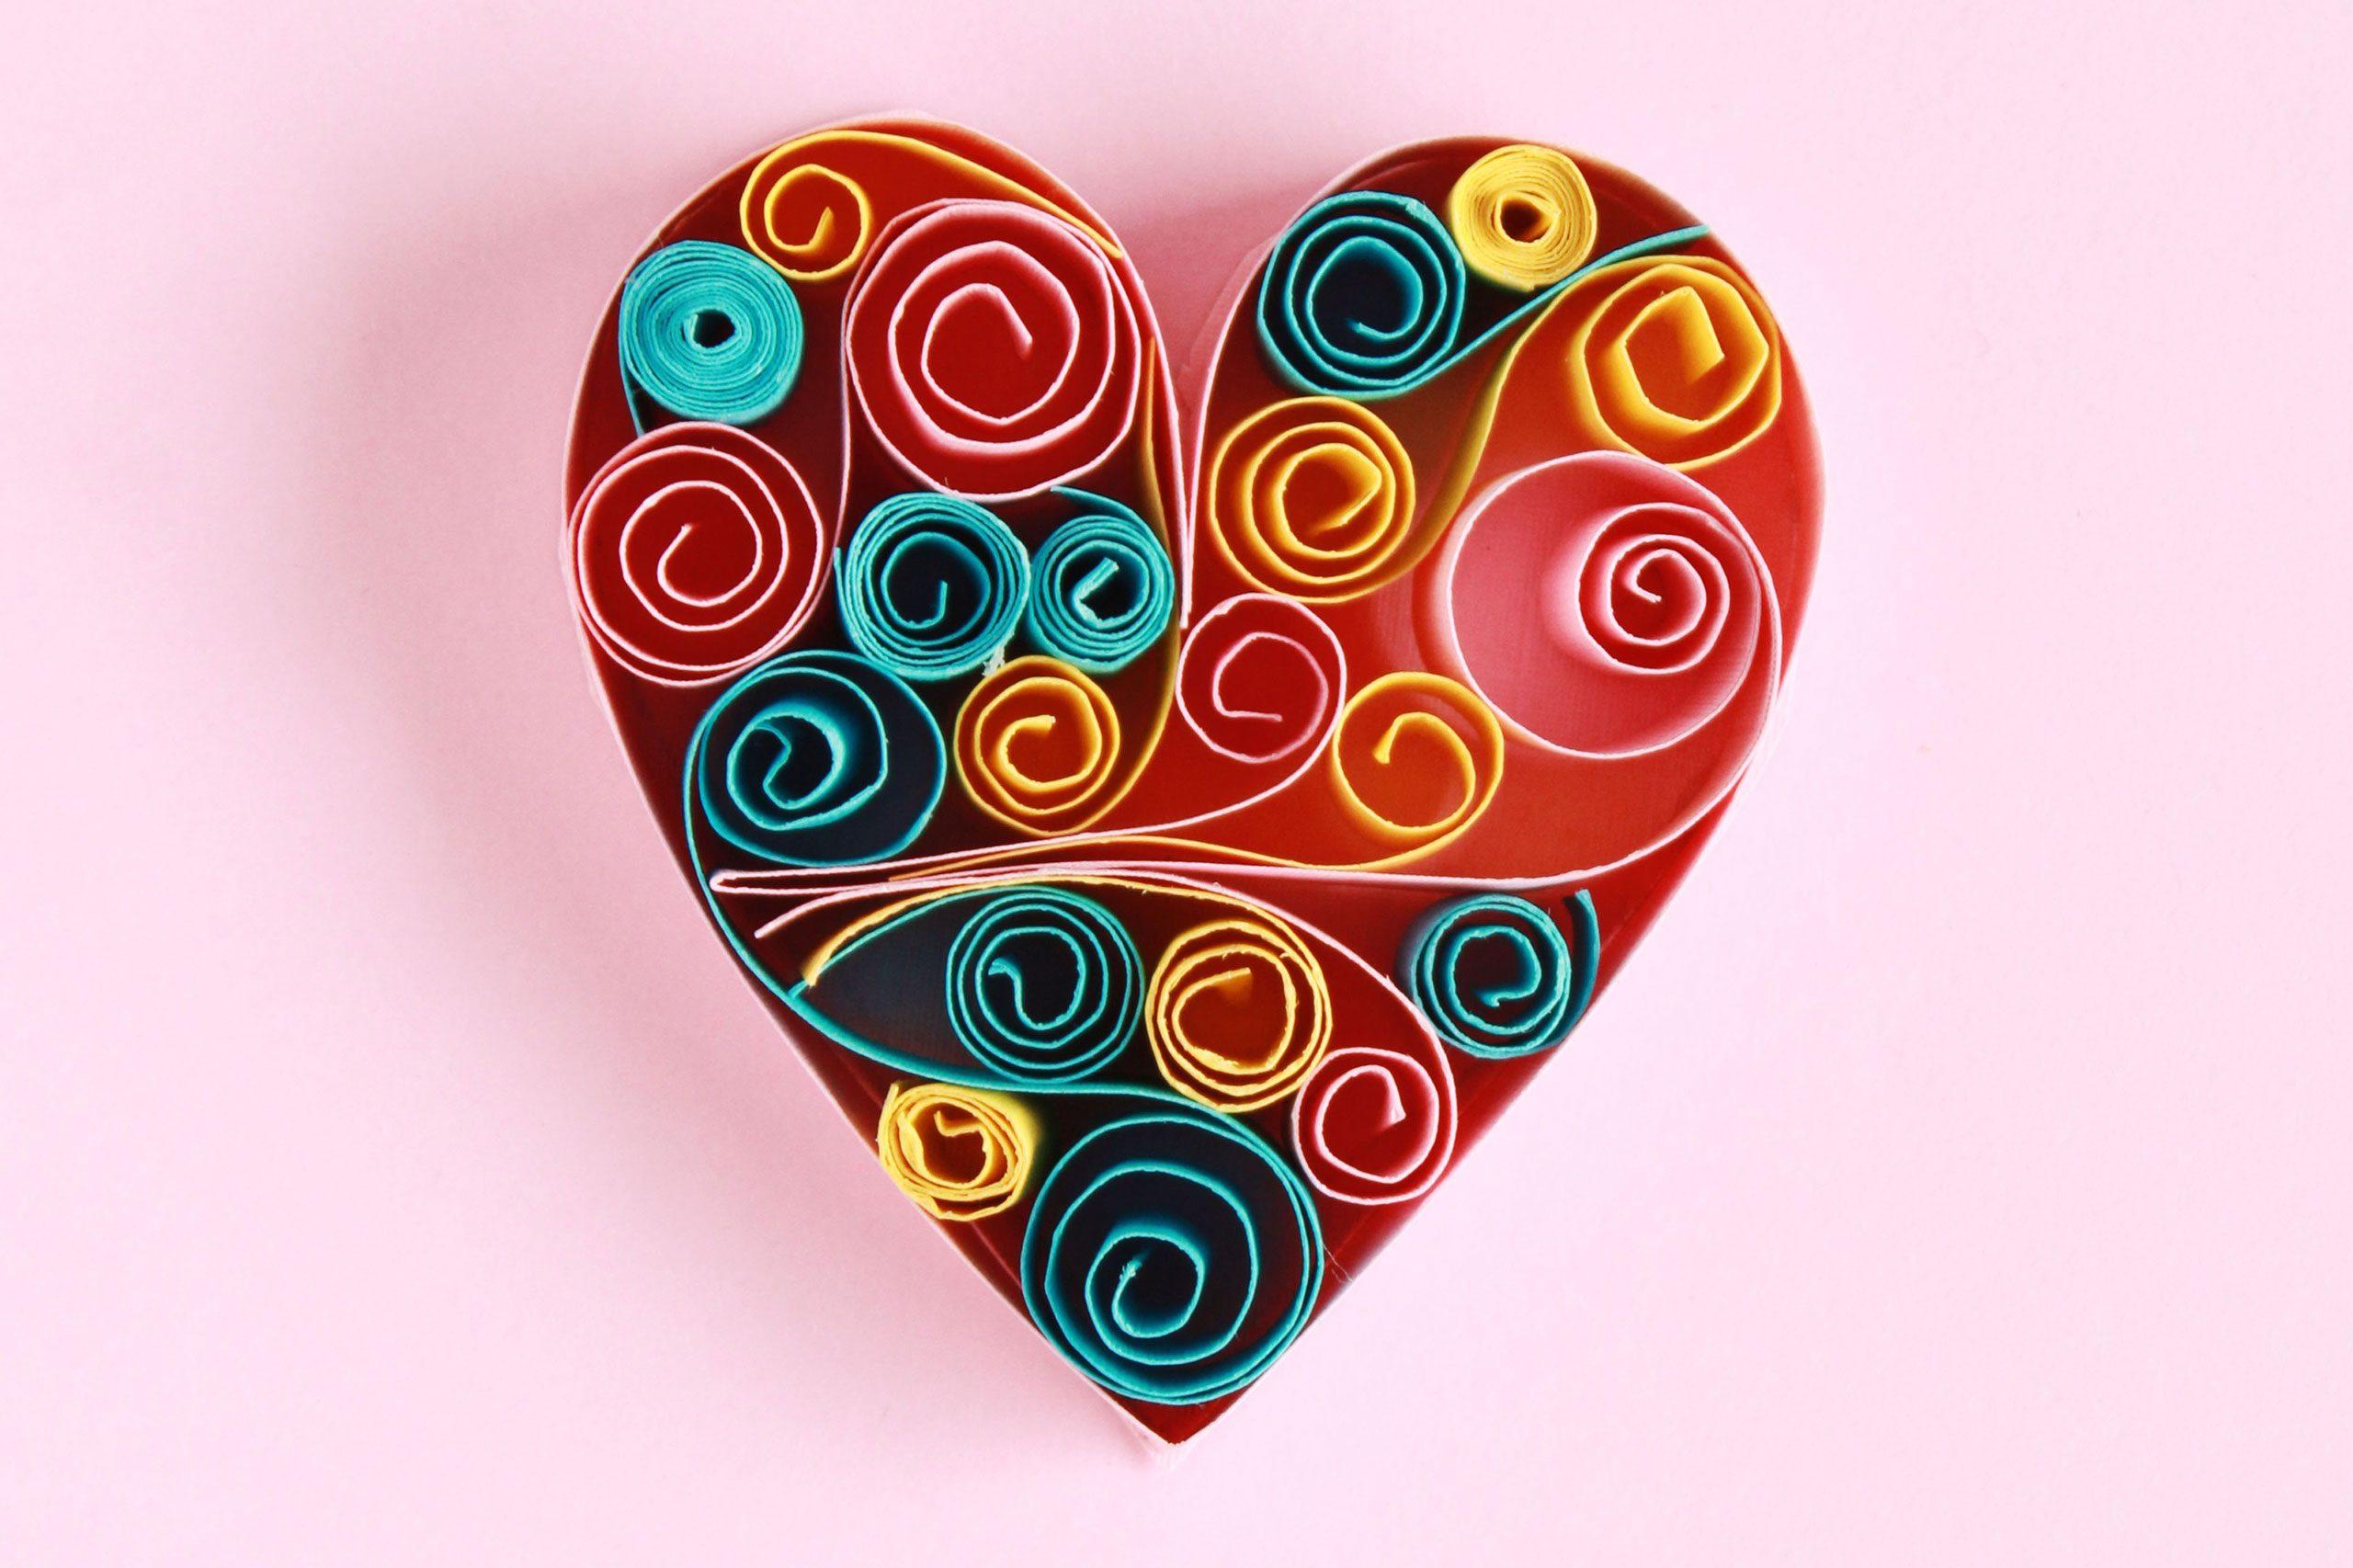 handmade paper quilling heart